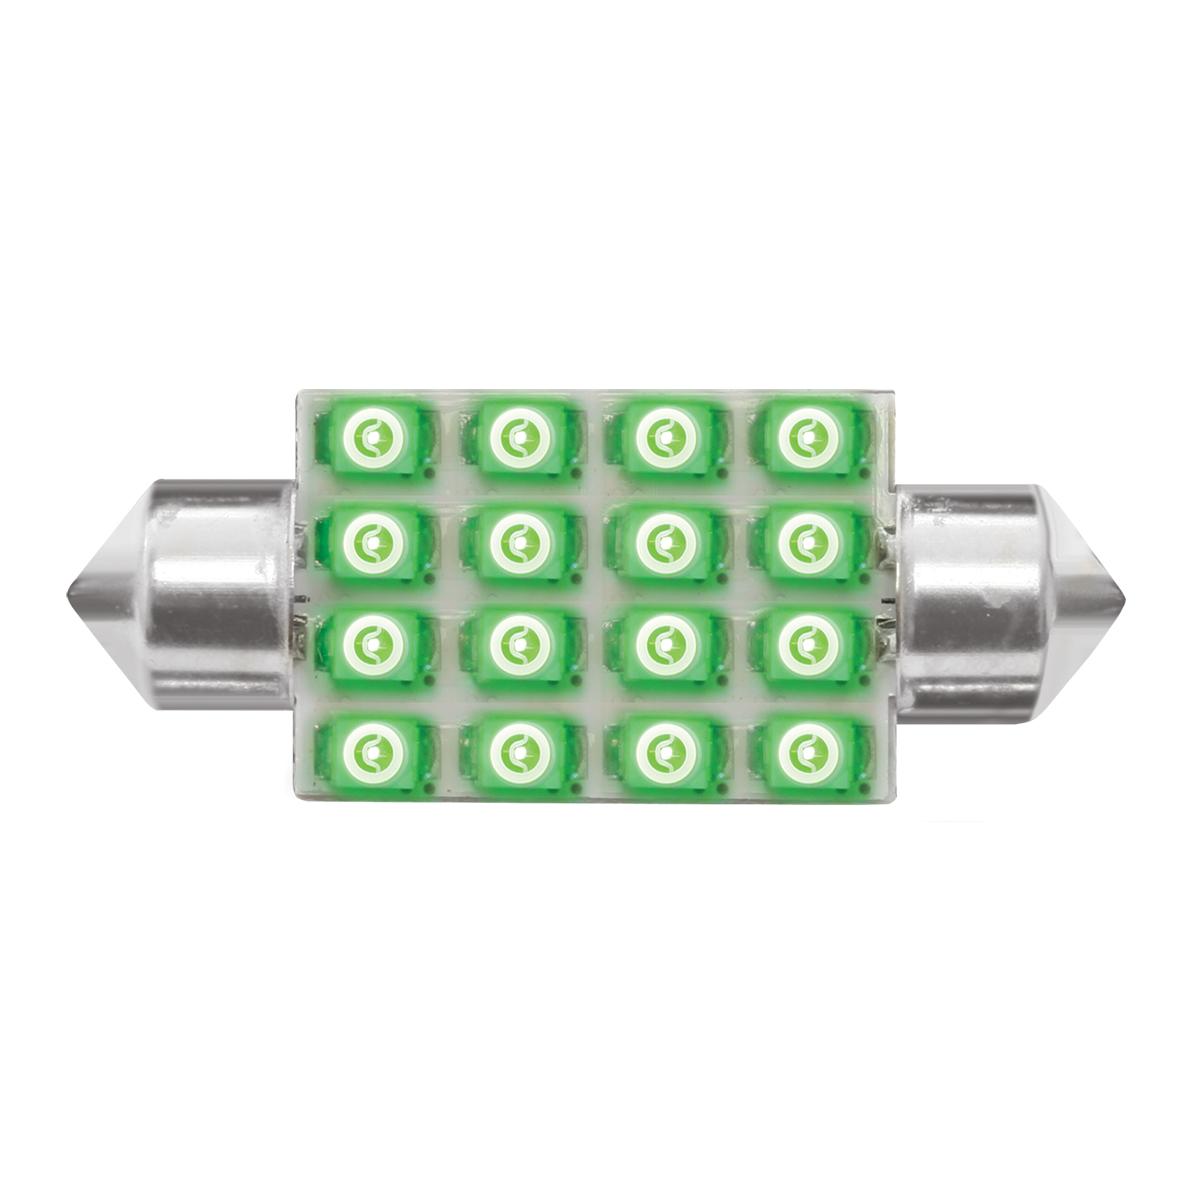 76102 Green 211-2 Dome Type 16 LED Light Bulb